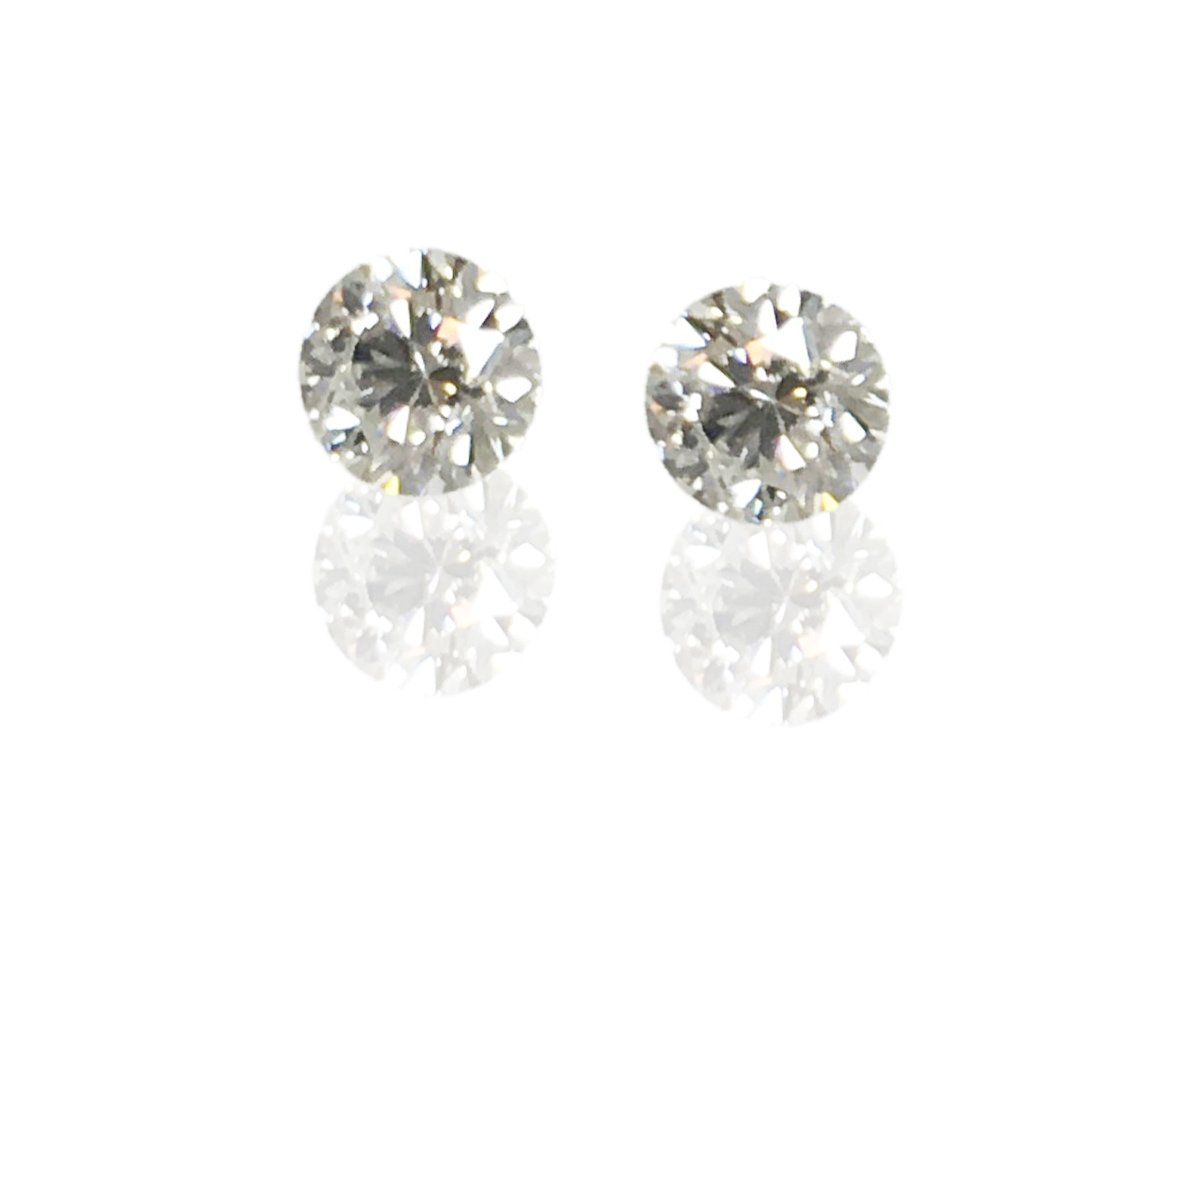 2.4CT TW 14k White Gold Diamond Studs  90dd02aa5